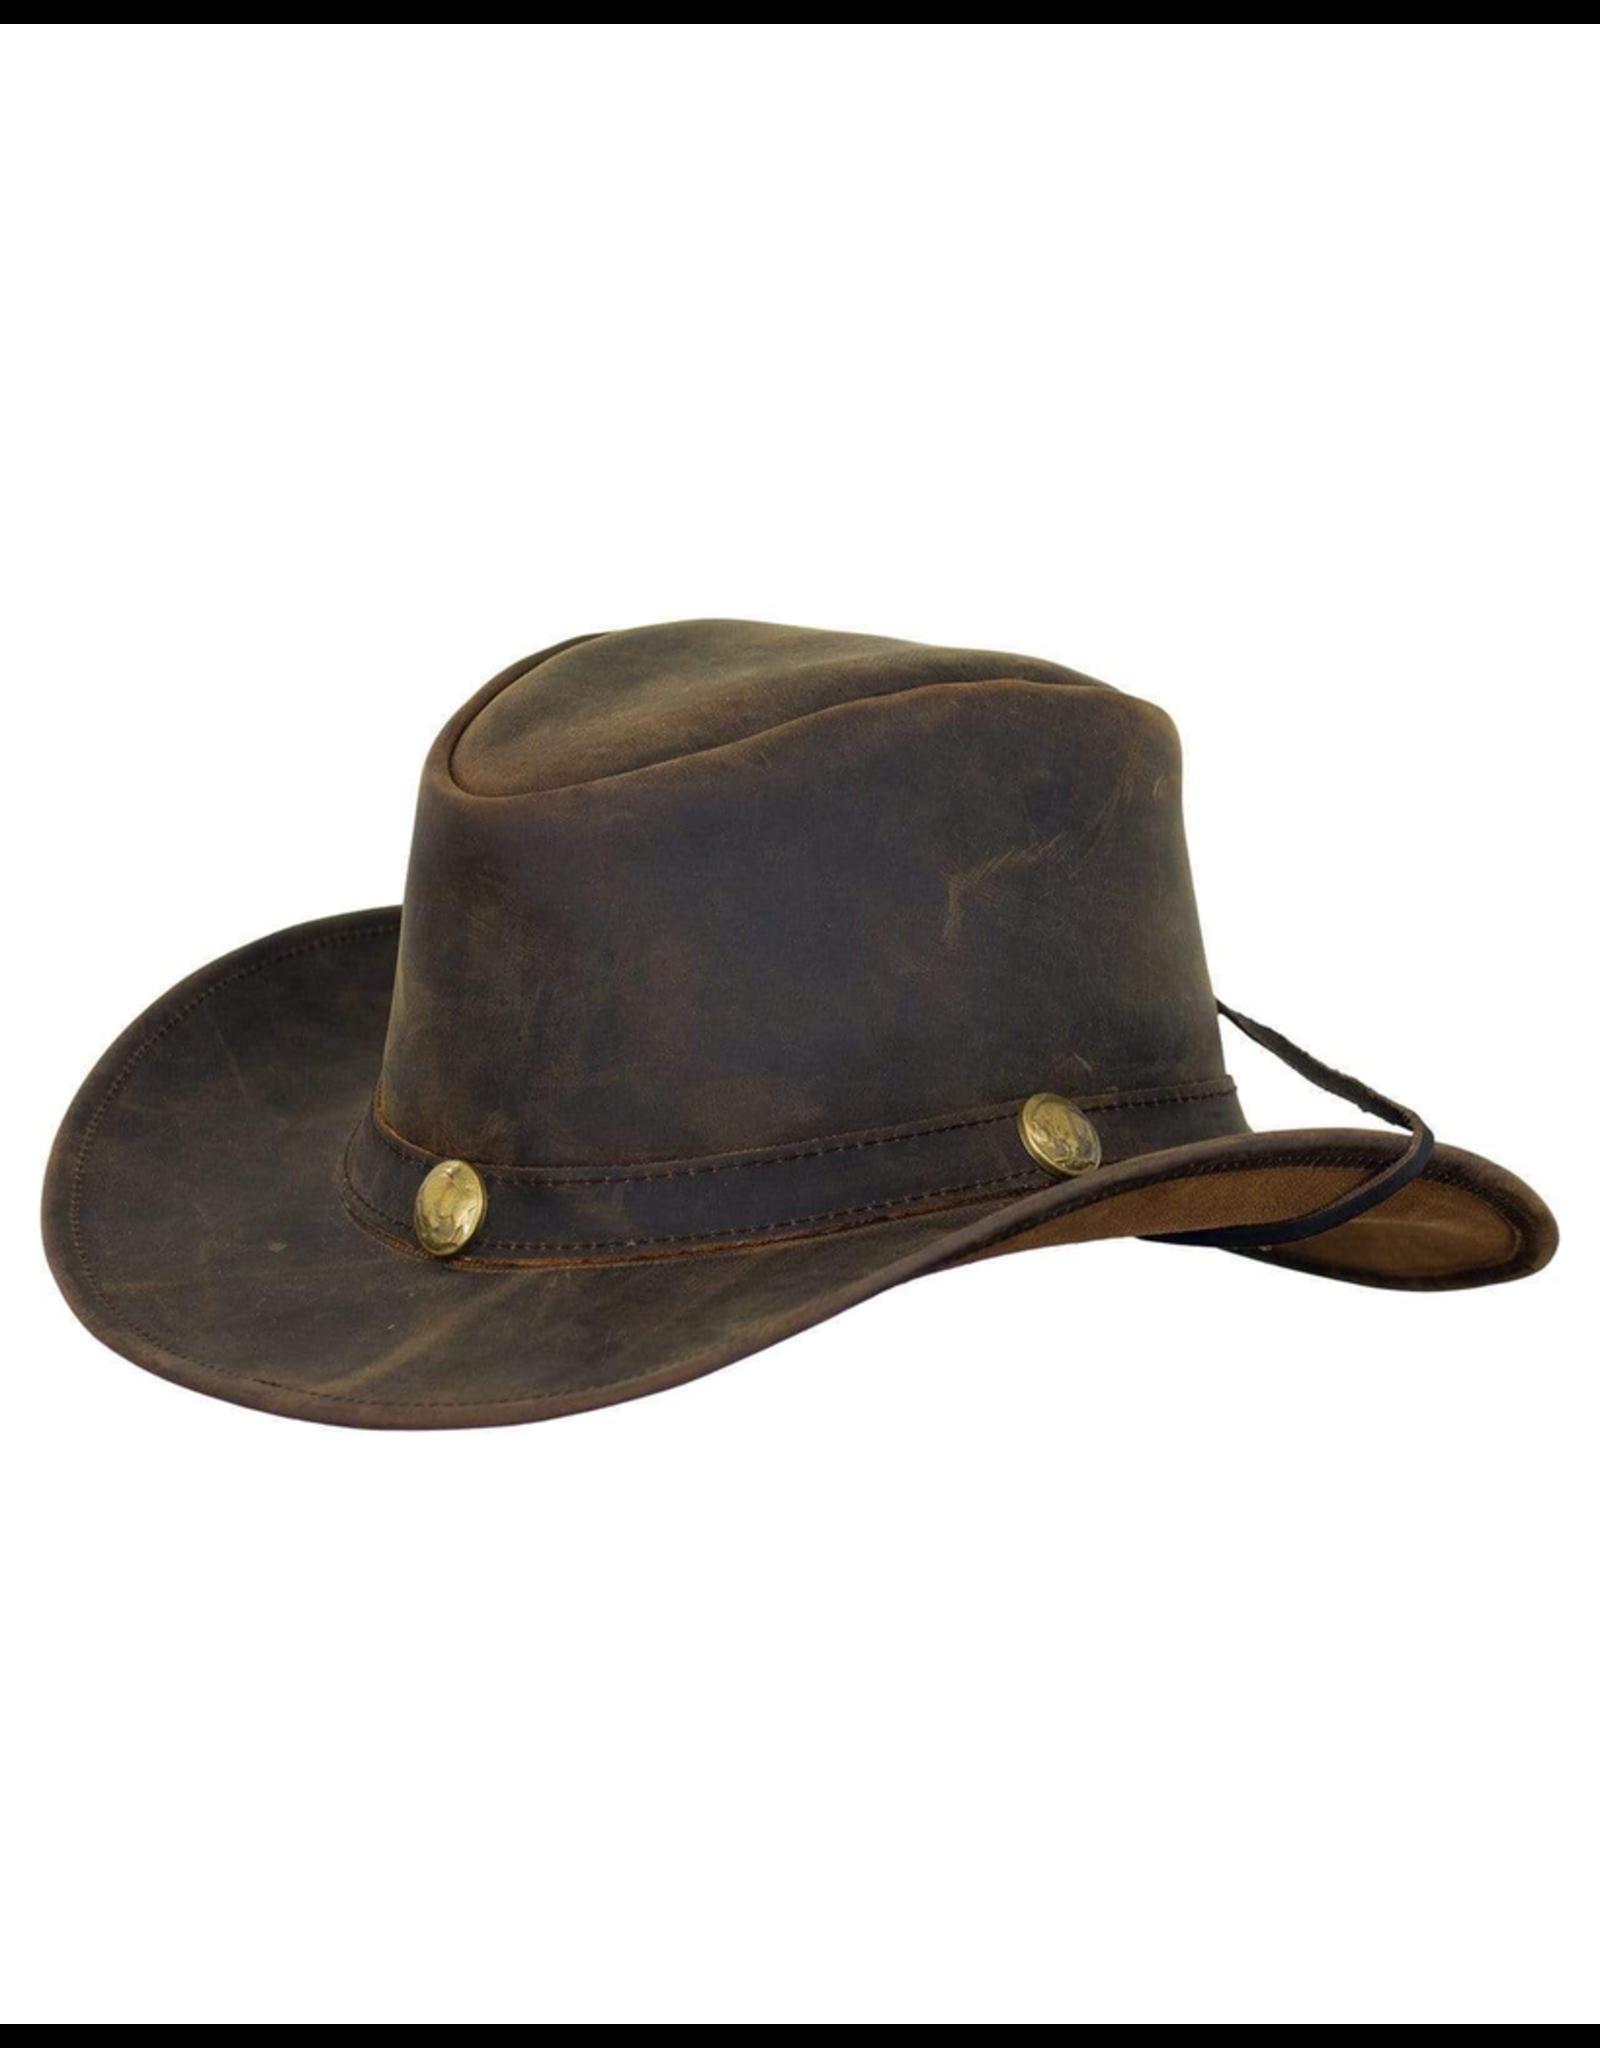 Hats OUTBACK Cheyenne No.13006